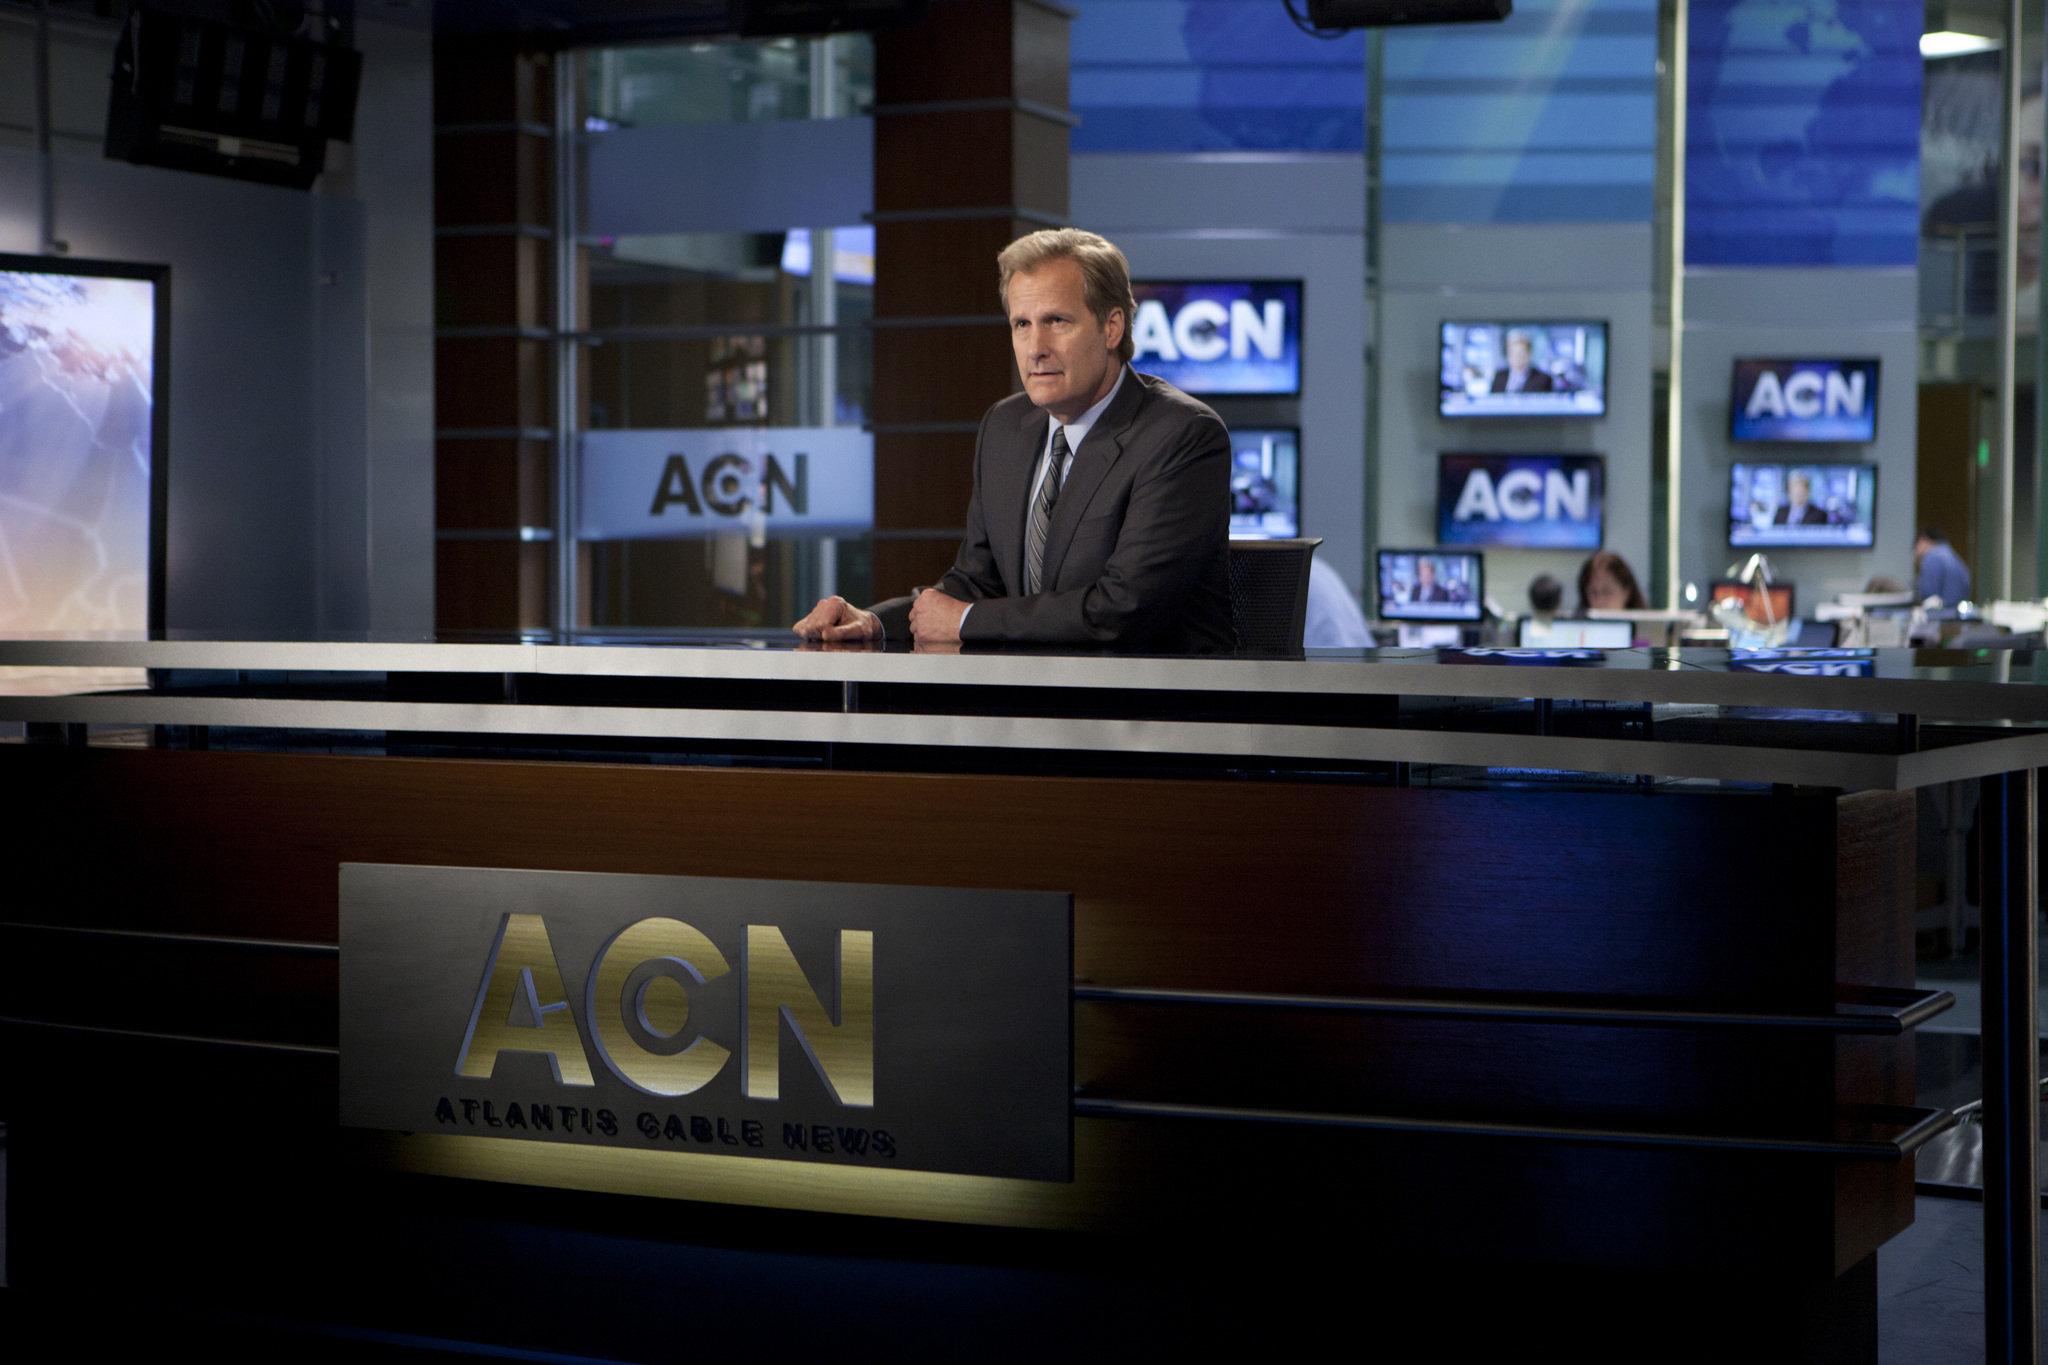 http://buzzhub.files.wordpress.com/2012/08/newsroom-hbo.jpg